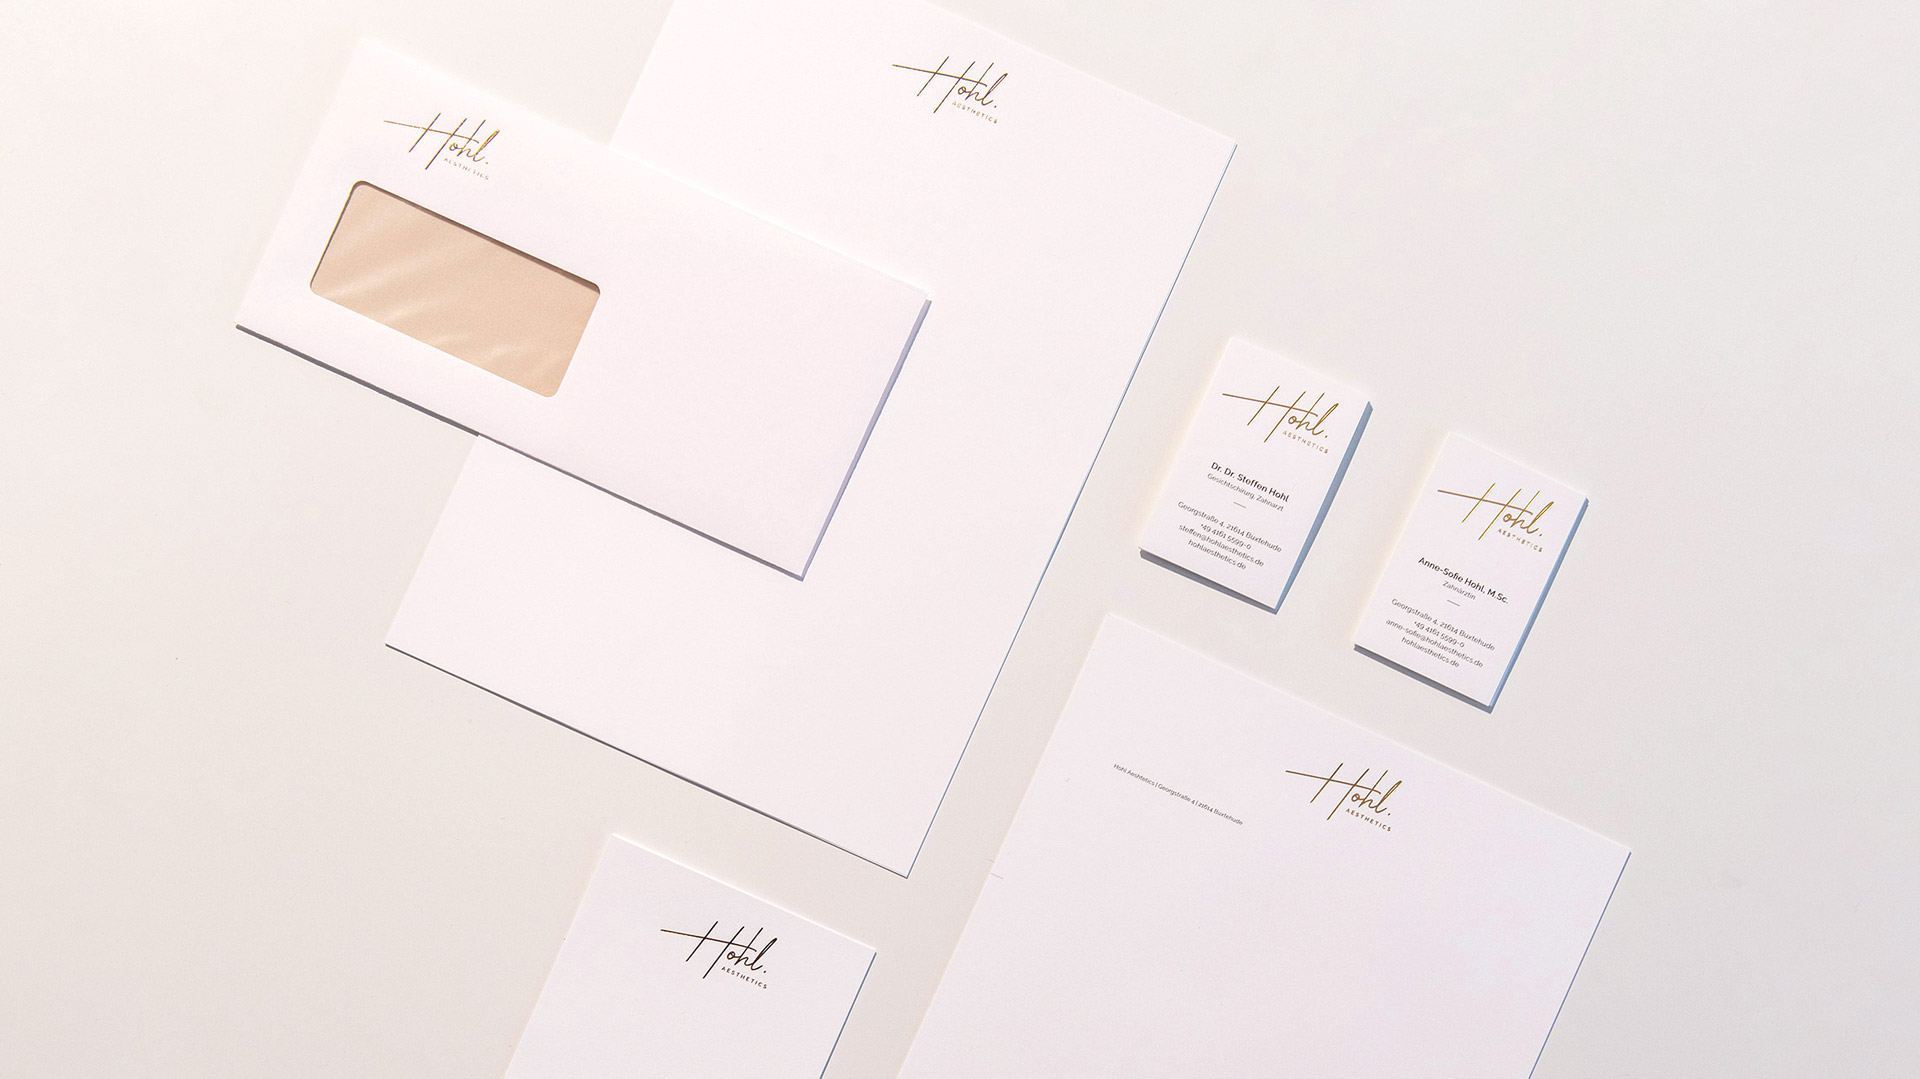 Freiraum Grafik Design Geschäftsausstattung – Briefpapier, Visitenkarten, Briefumschlag